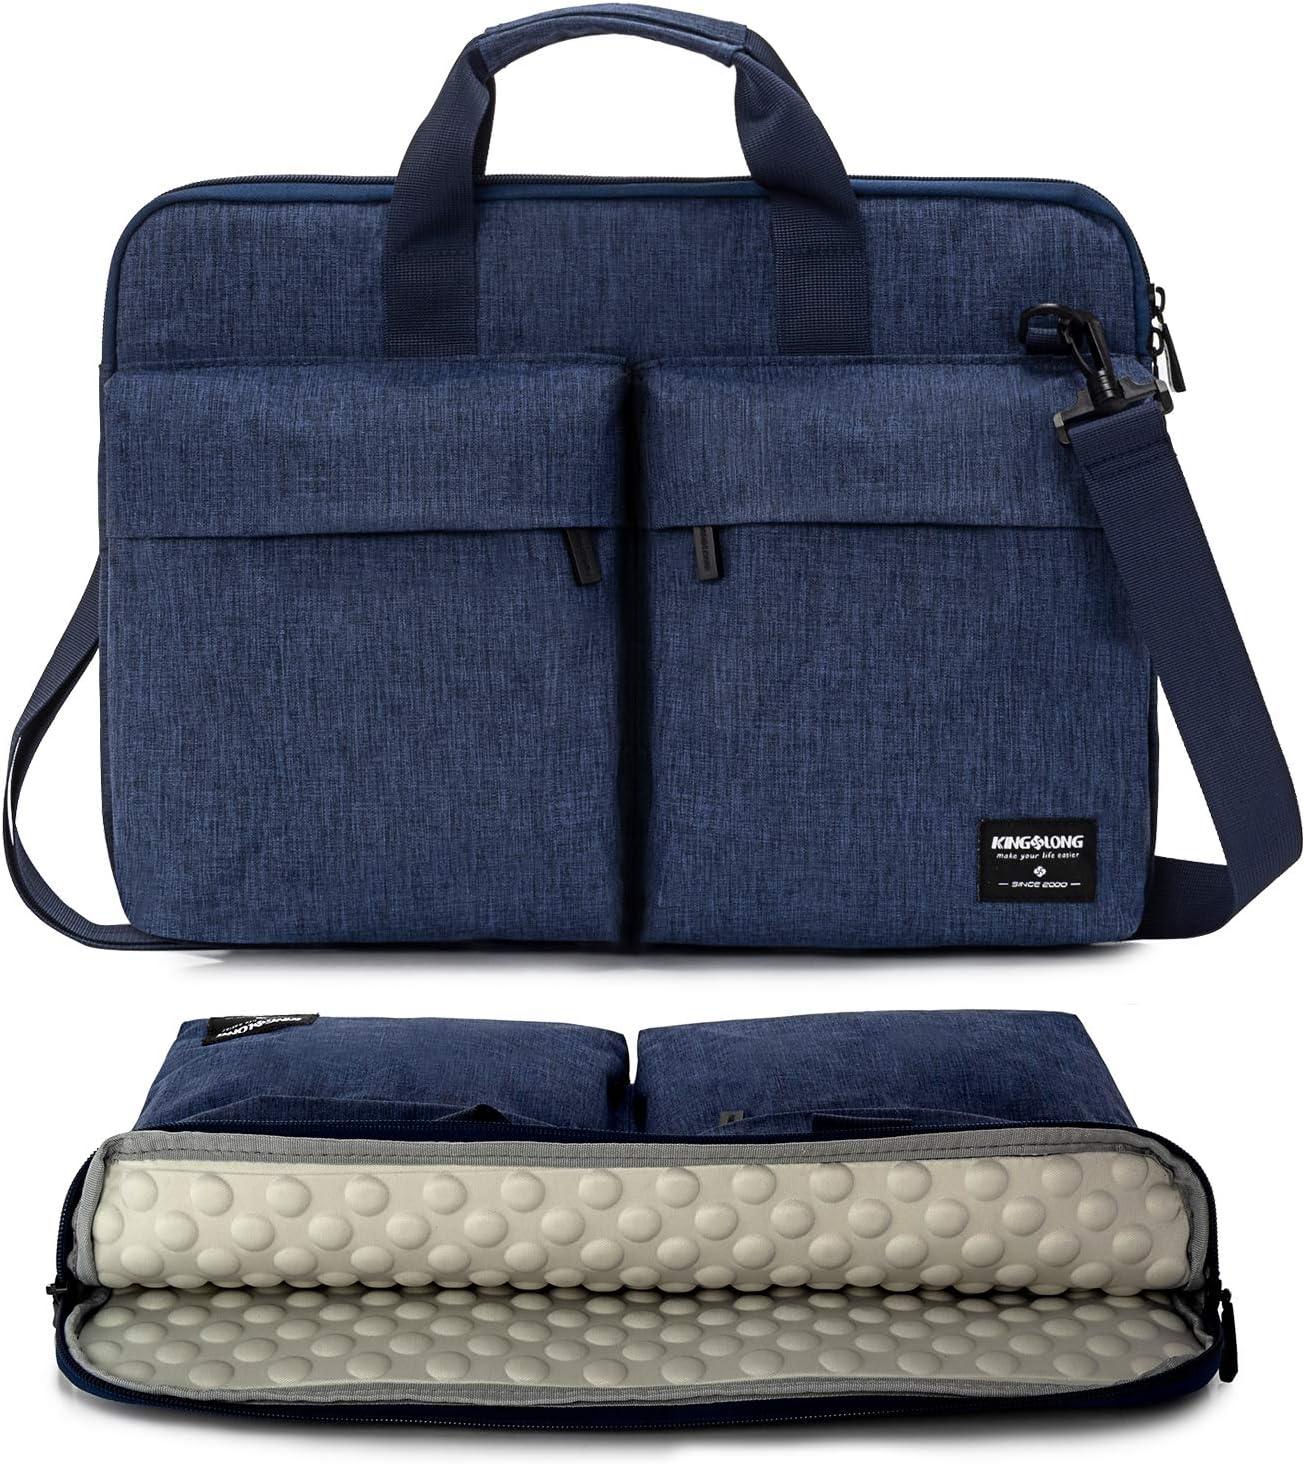 KINGSLONG 15 15.6 Inch Laptop Case Bag Sleeve, Lightweight Laptop Computer Notebook Ultrabooks Carrying Case Sleeve Handbag Cover for Men Women Fit for Acer Asus Dell Lenovo HP Toshiba, Blue